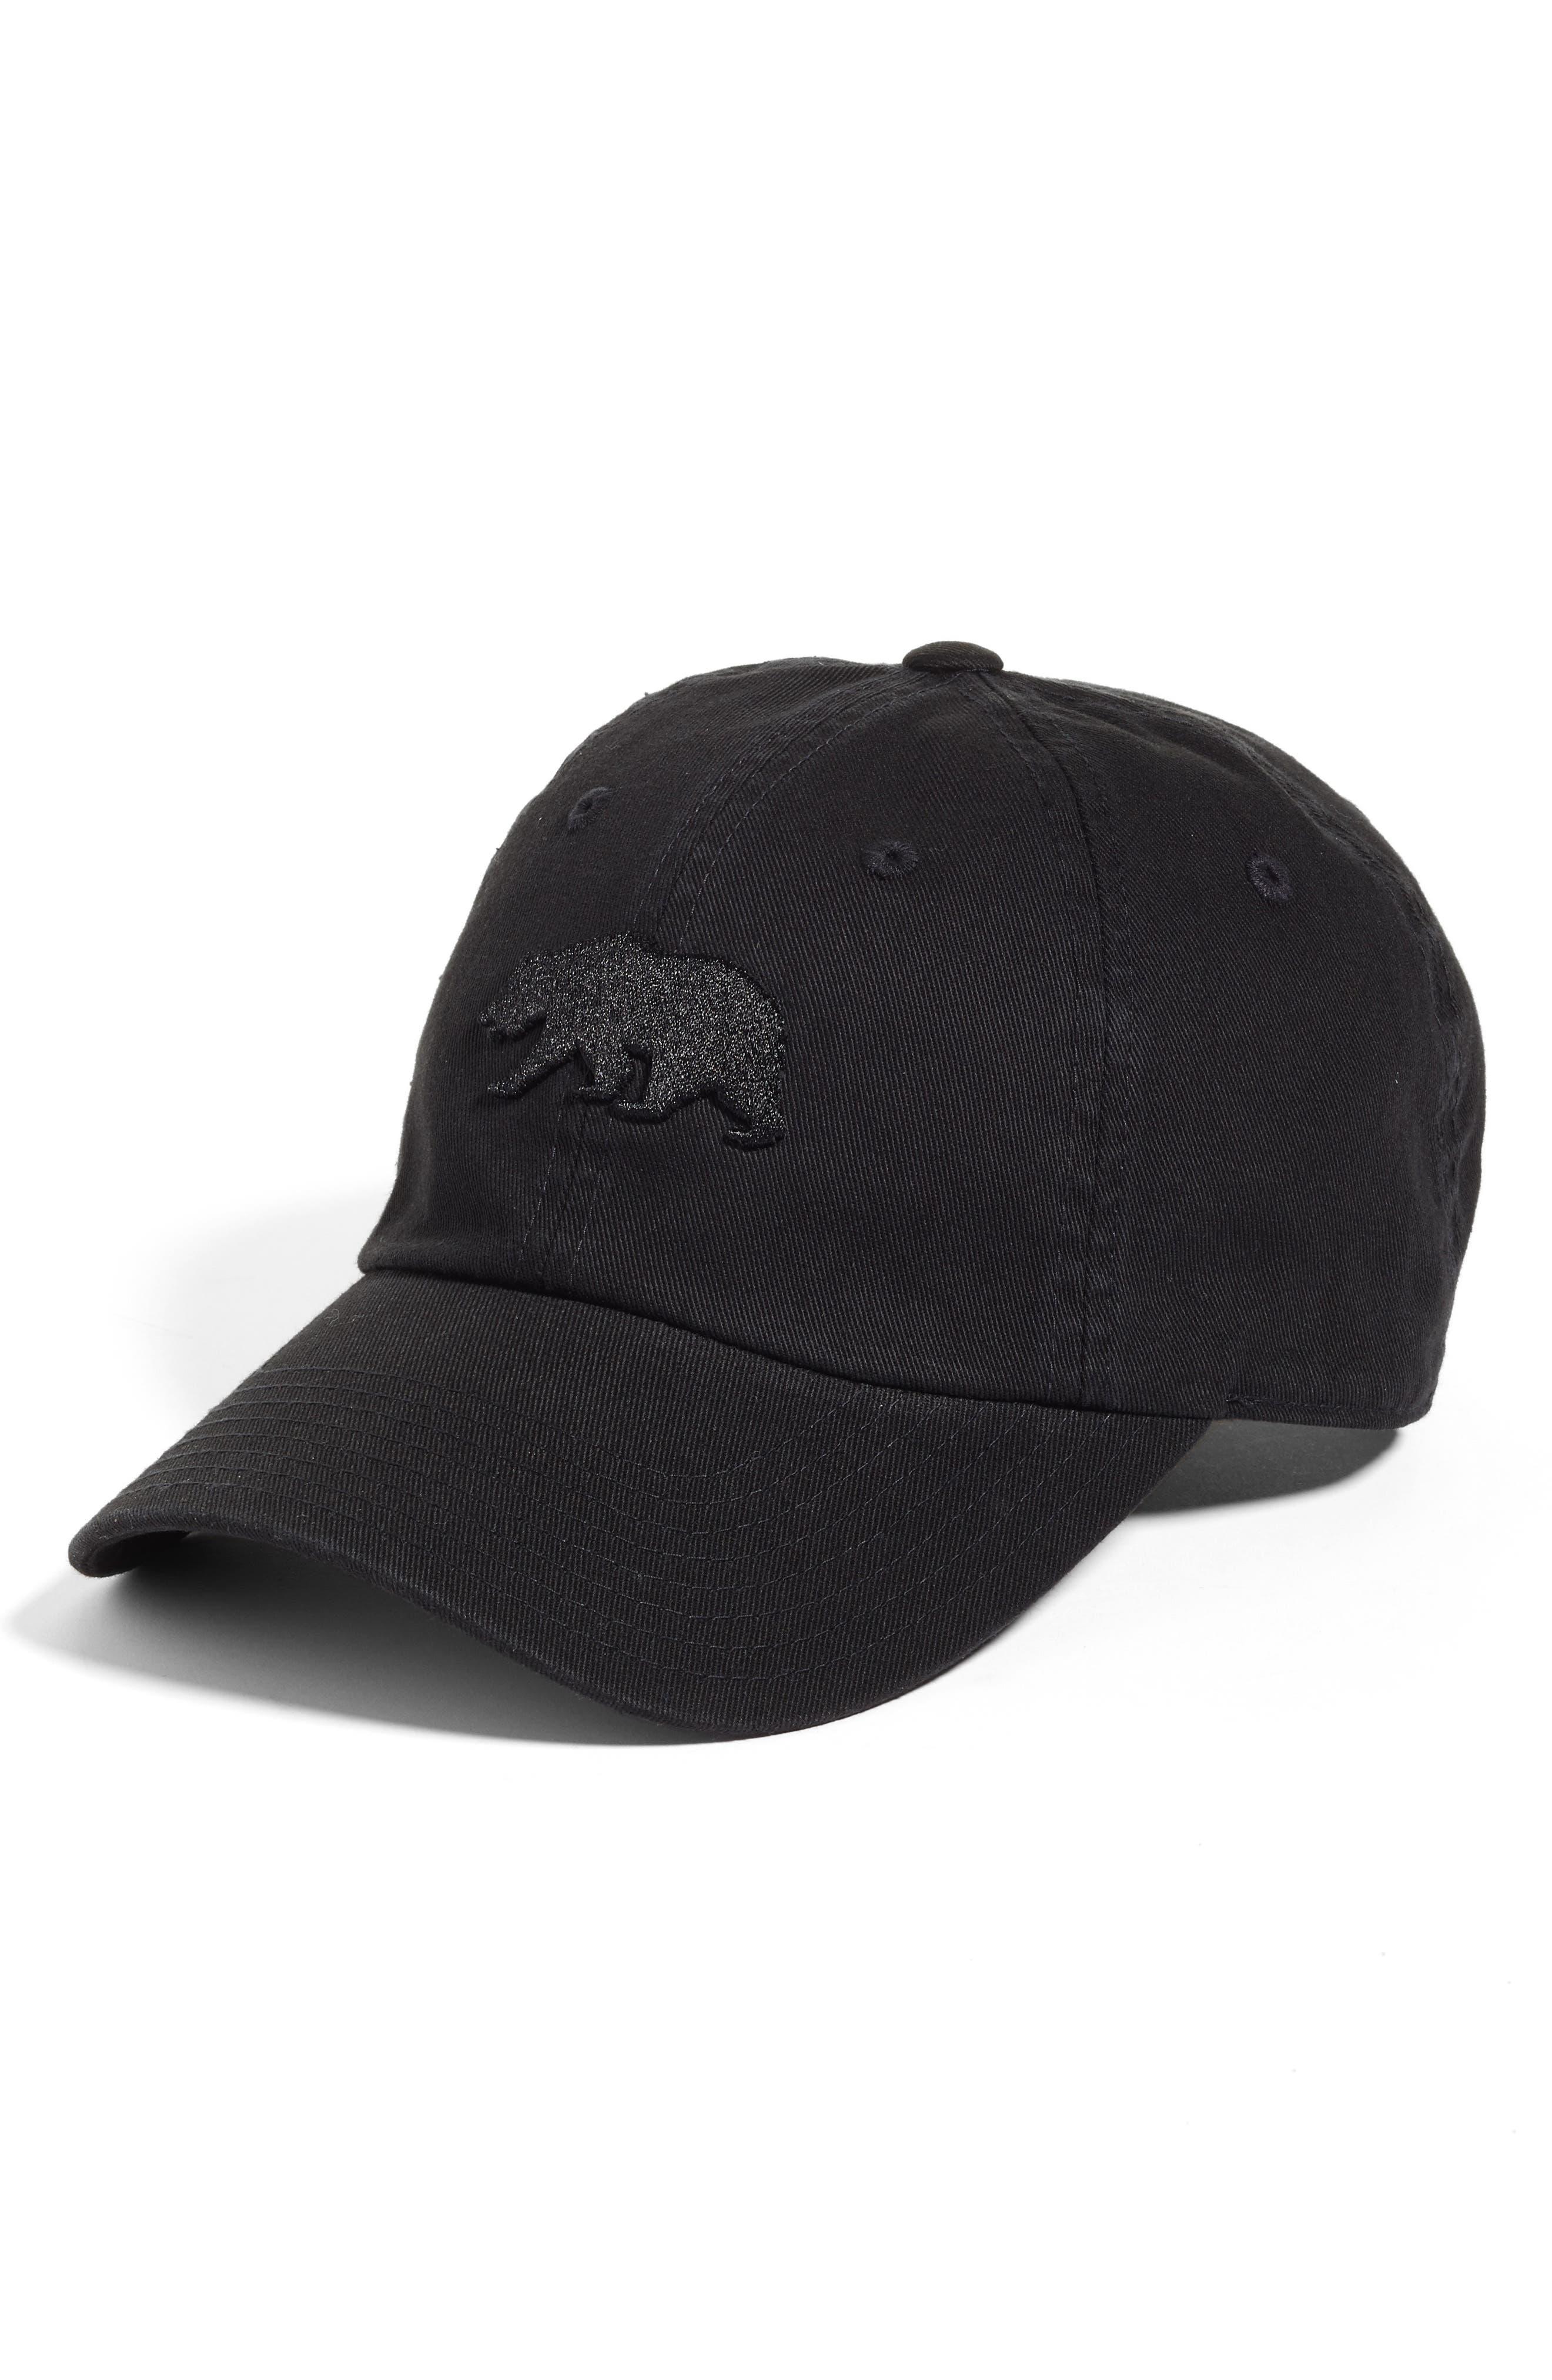 American Needle Cali Baseball Cap